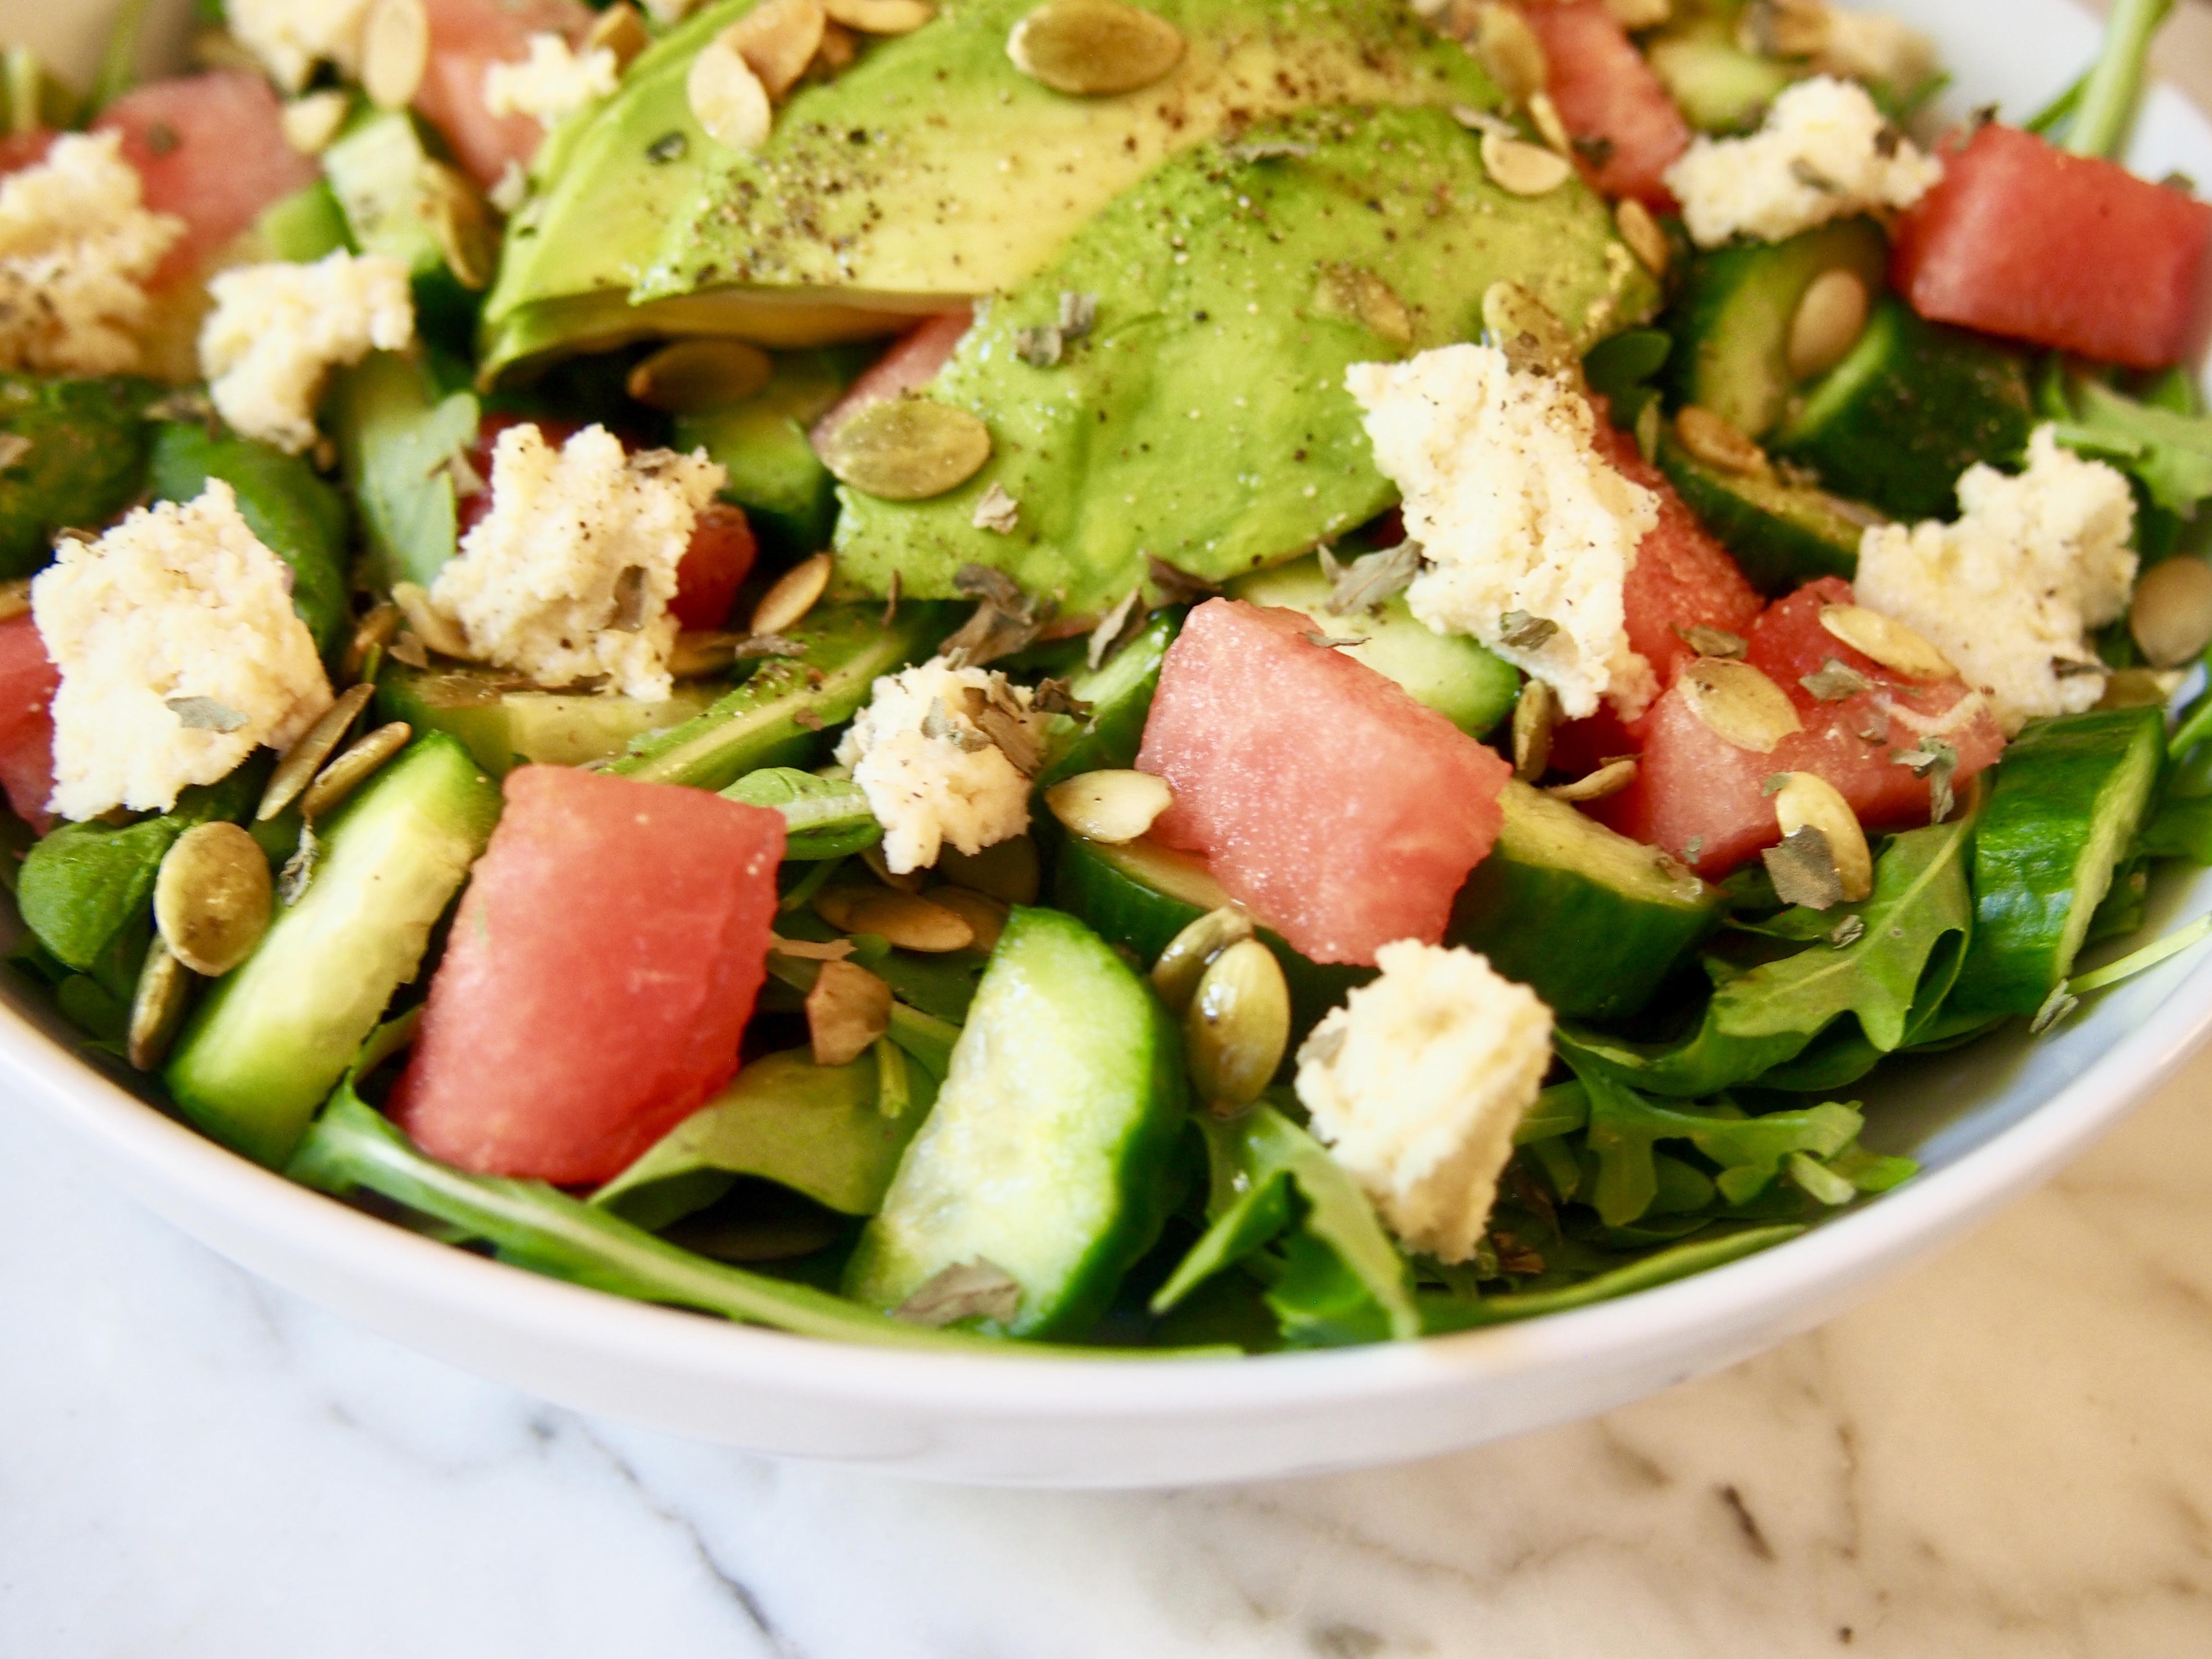 Why You Should Eat More Watermelon + Vegan Watermelon Feta Salad Recipe